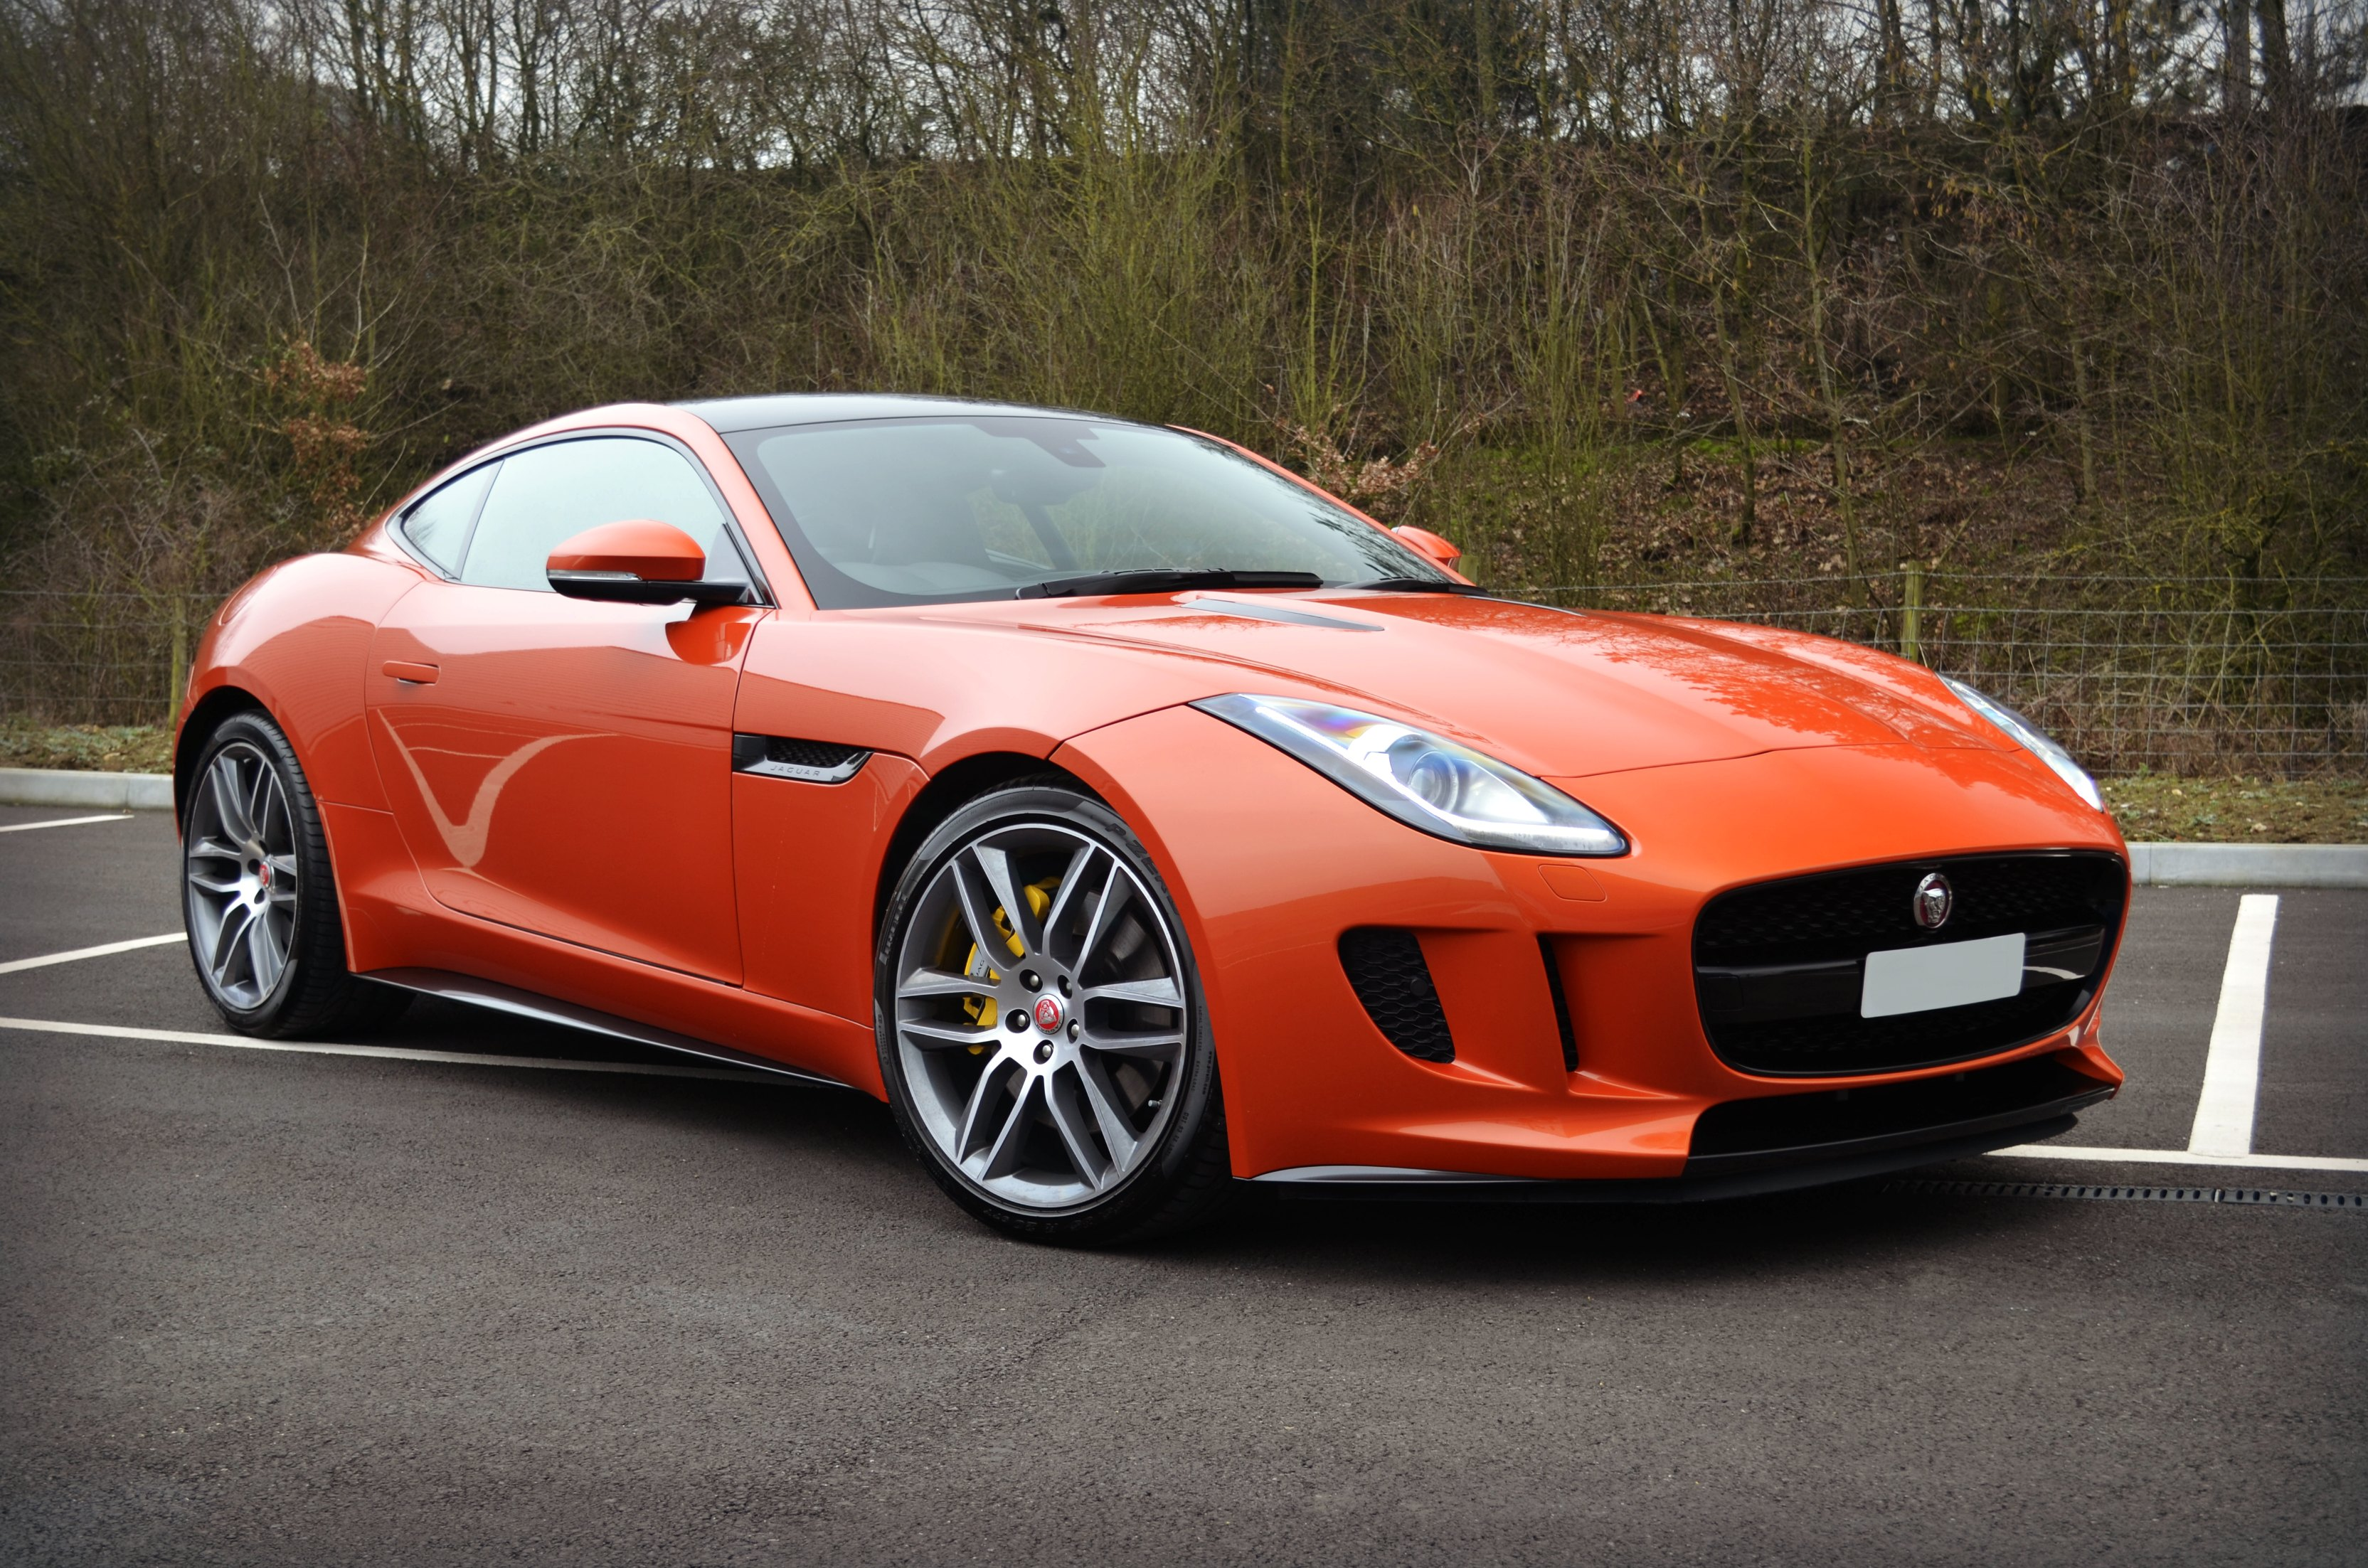 Amazing Jaguar F Type S (Kent) For Hire From £325 Ex VAT